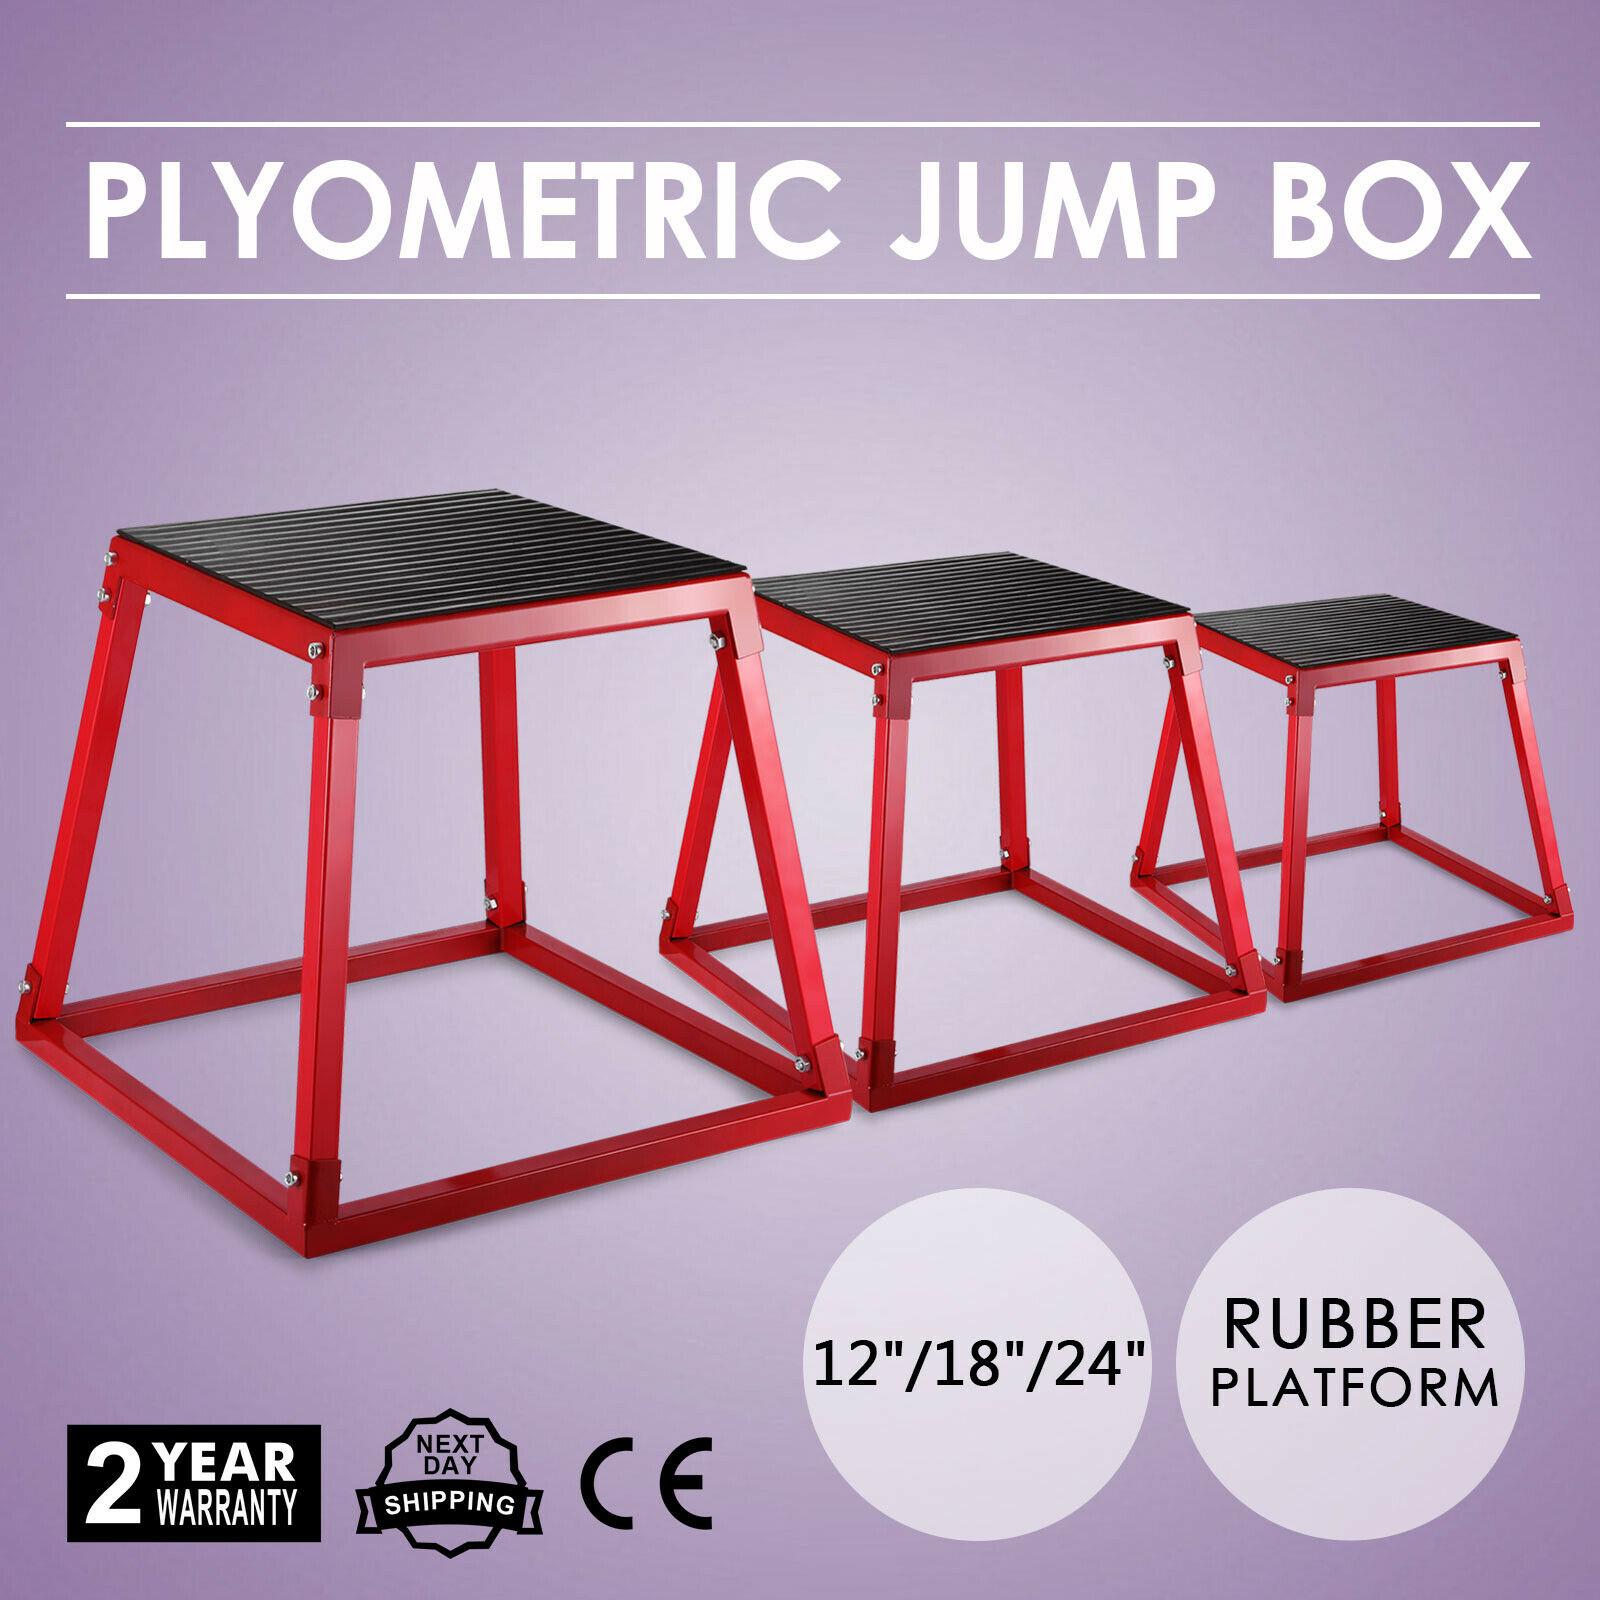 VEVOR Plyometric Boxes 12 Inch 18 Inch 24 Inch Plyometric Platform Jump Box Exercise